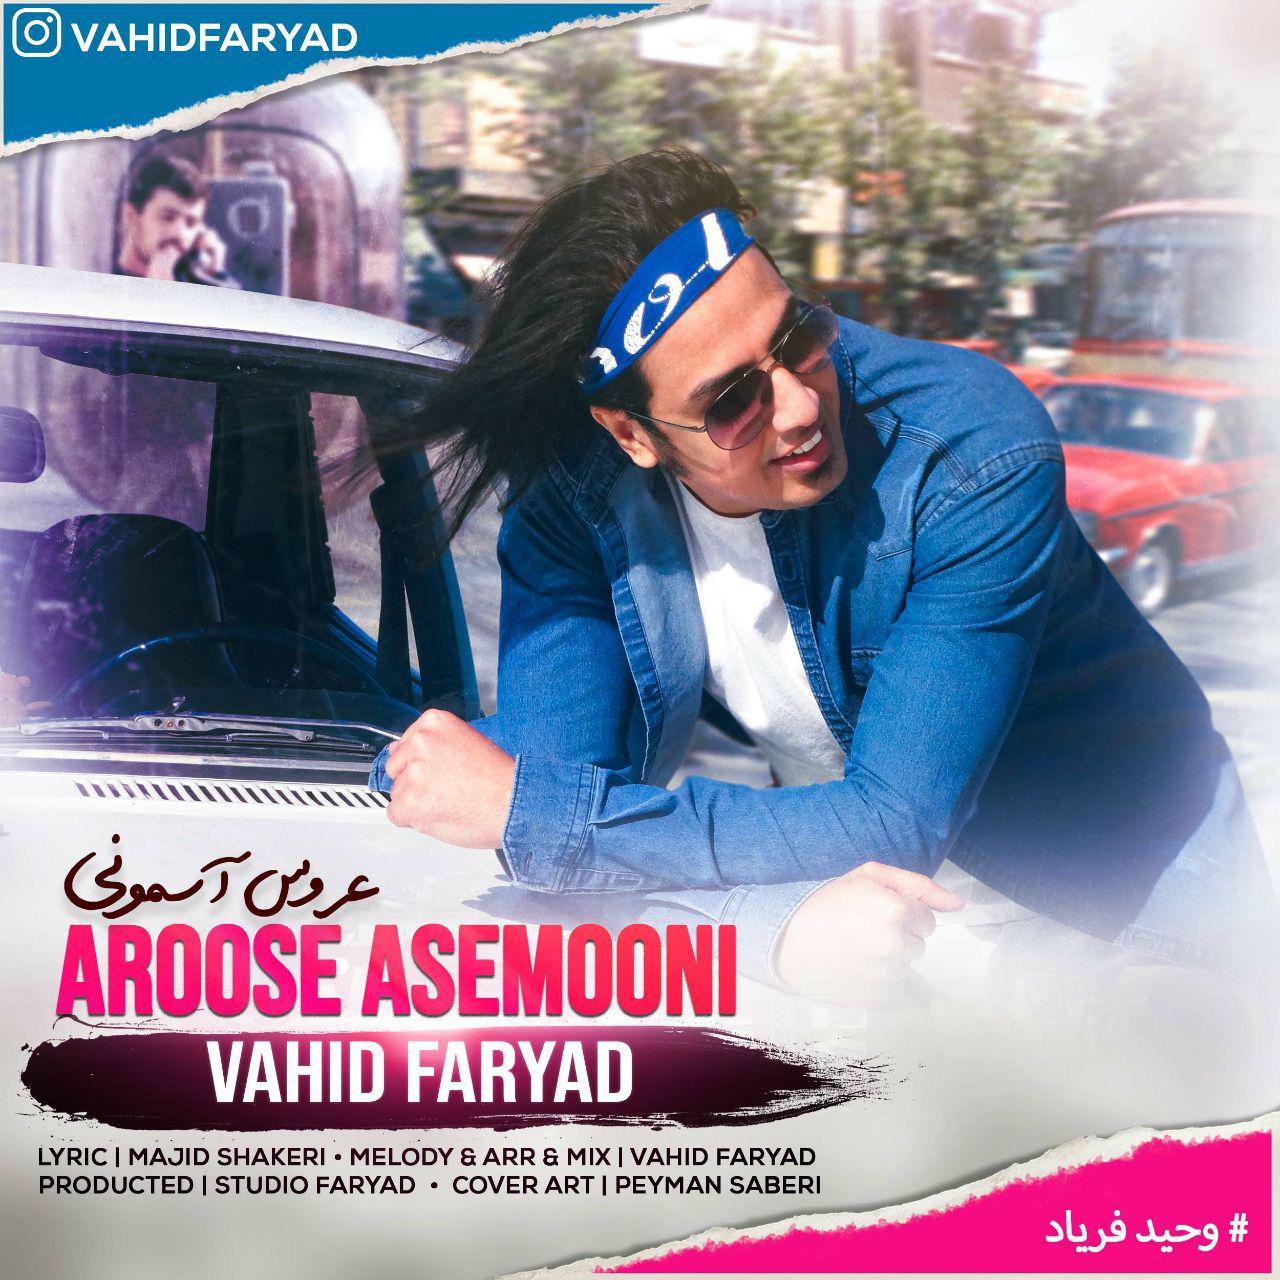 Vahid Faryad – Aroose Asemooni